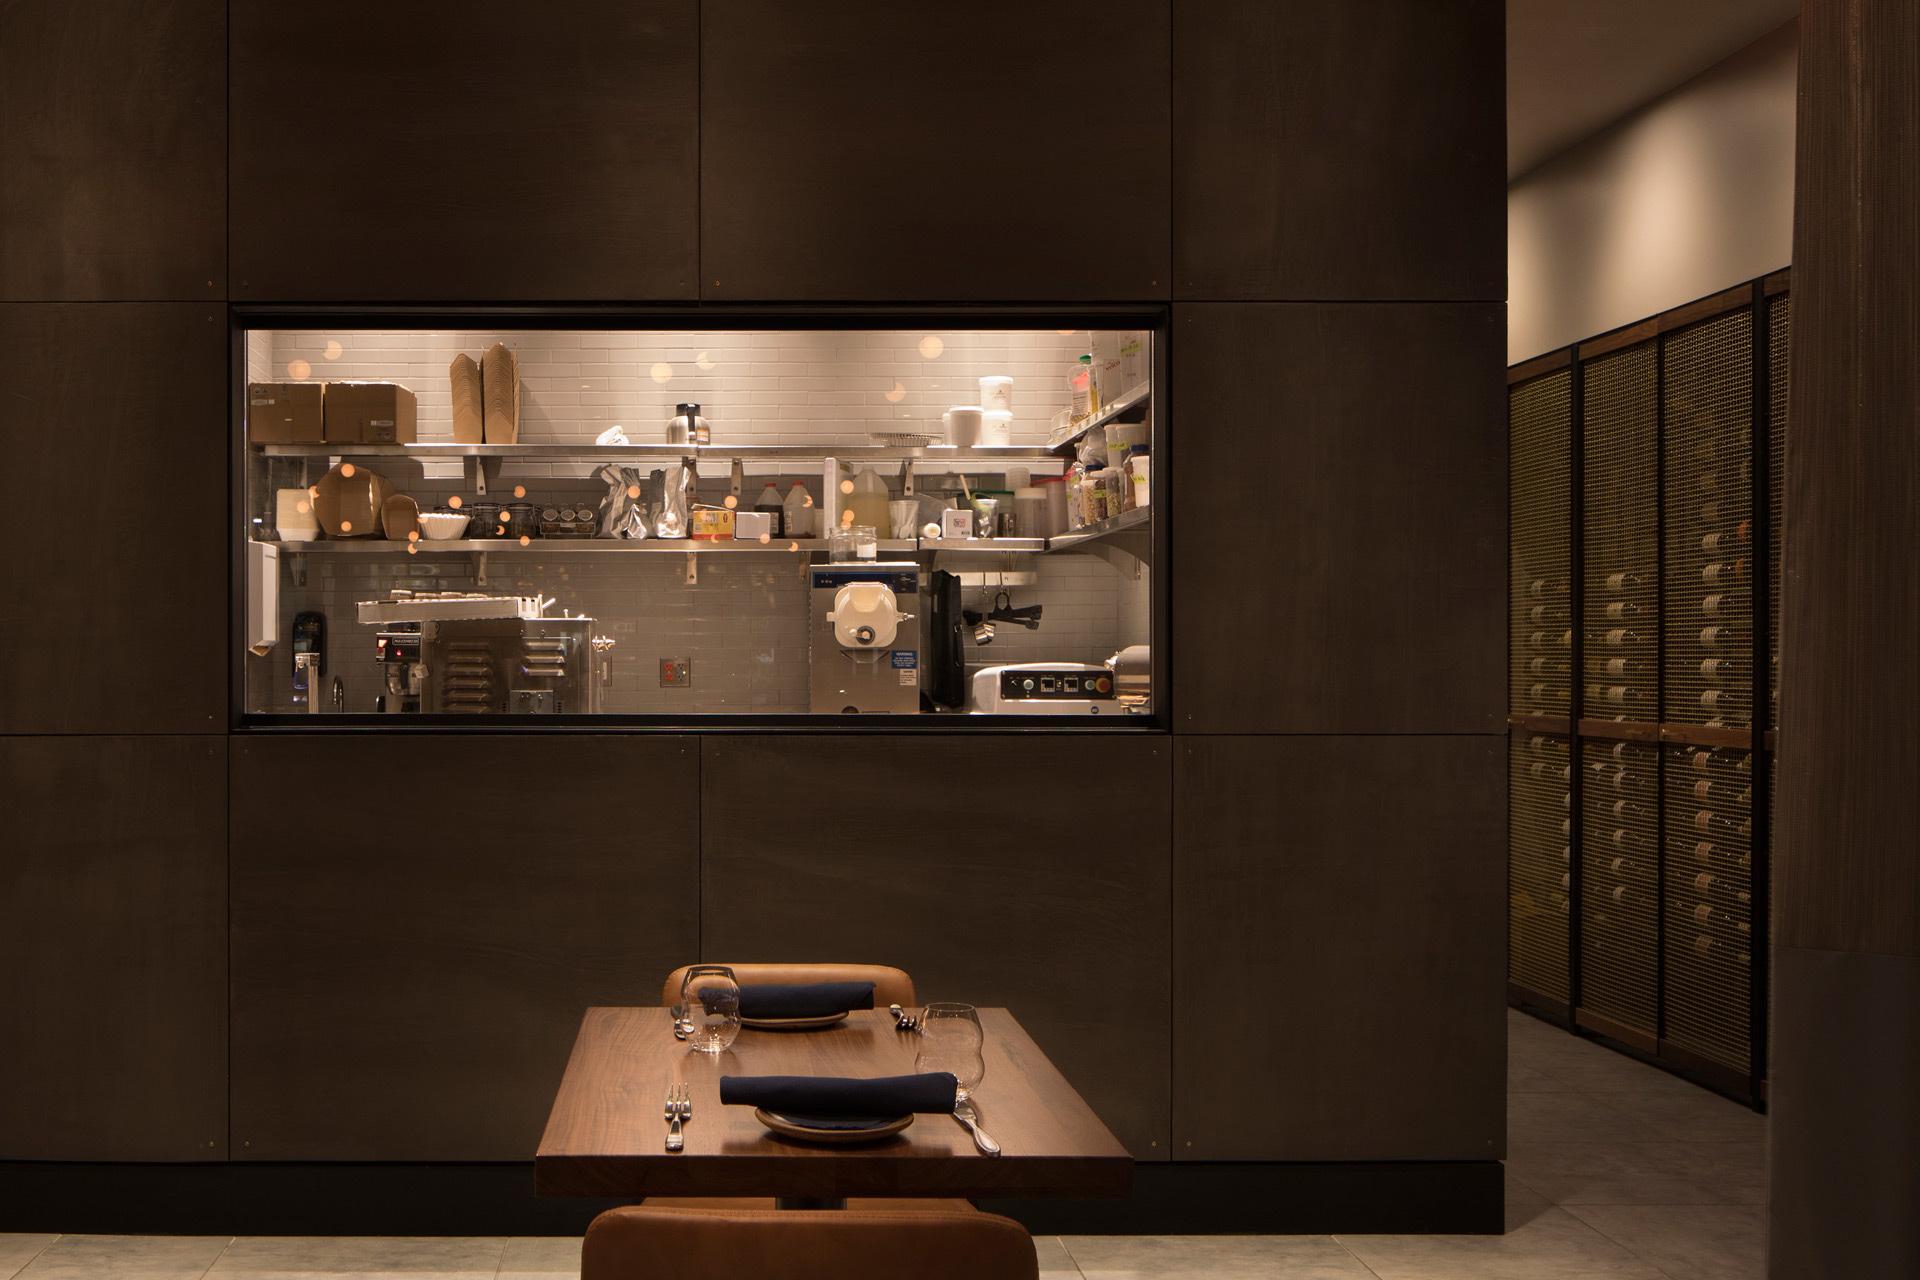 Pausa Bar & Cookery restaurant interiors